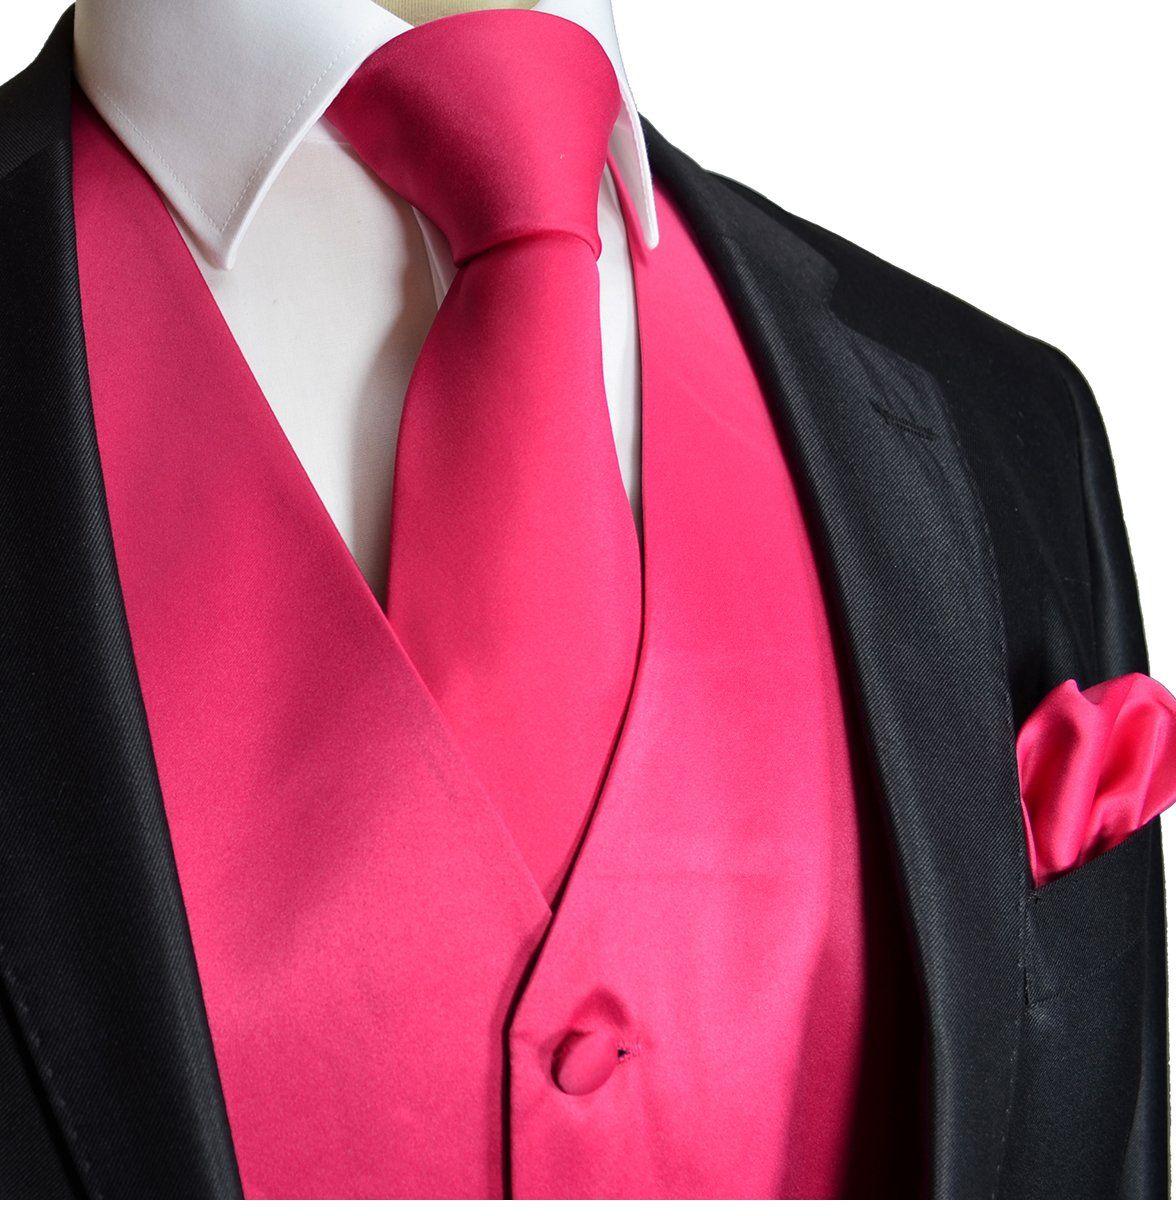 Brand Q Wedding Vest Set Solid Pink 3pcs Tuxedo Vest + Necktie + ...